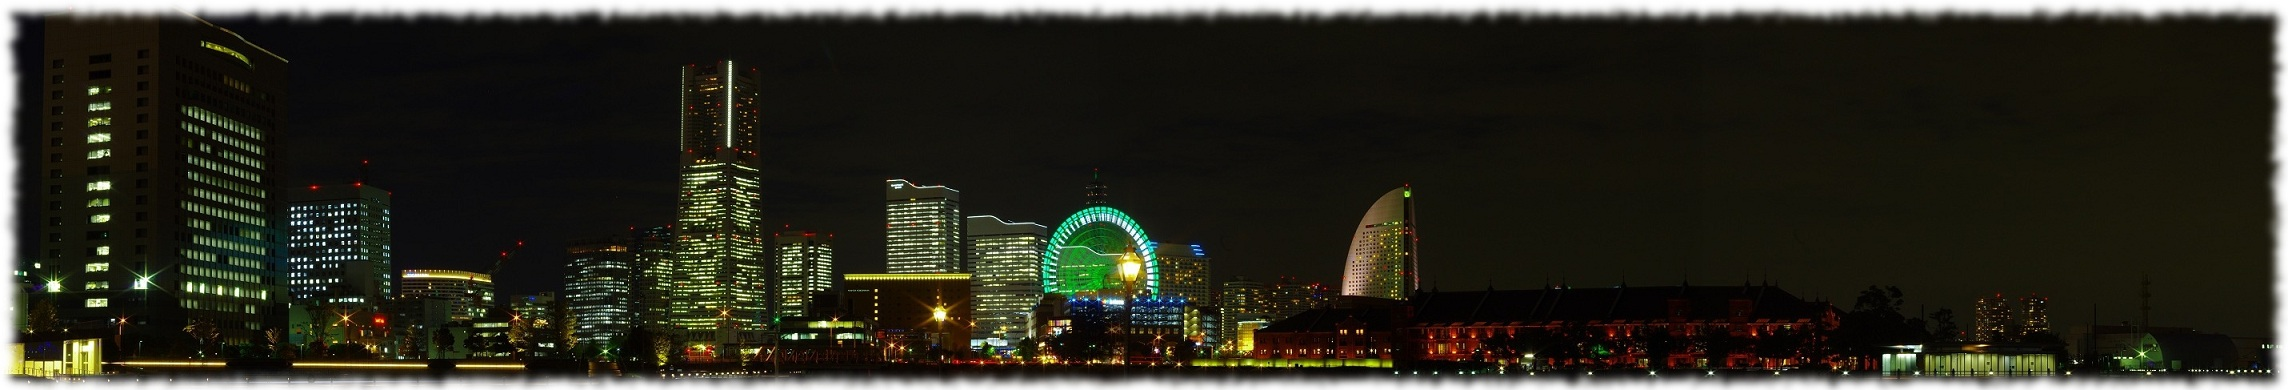 panorama1027.jpg